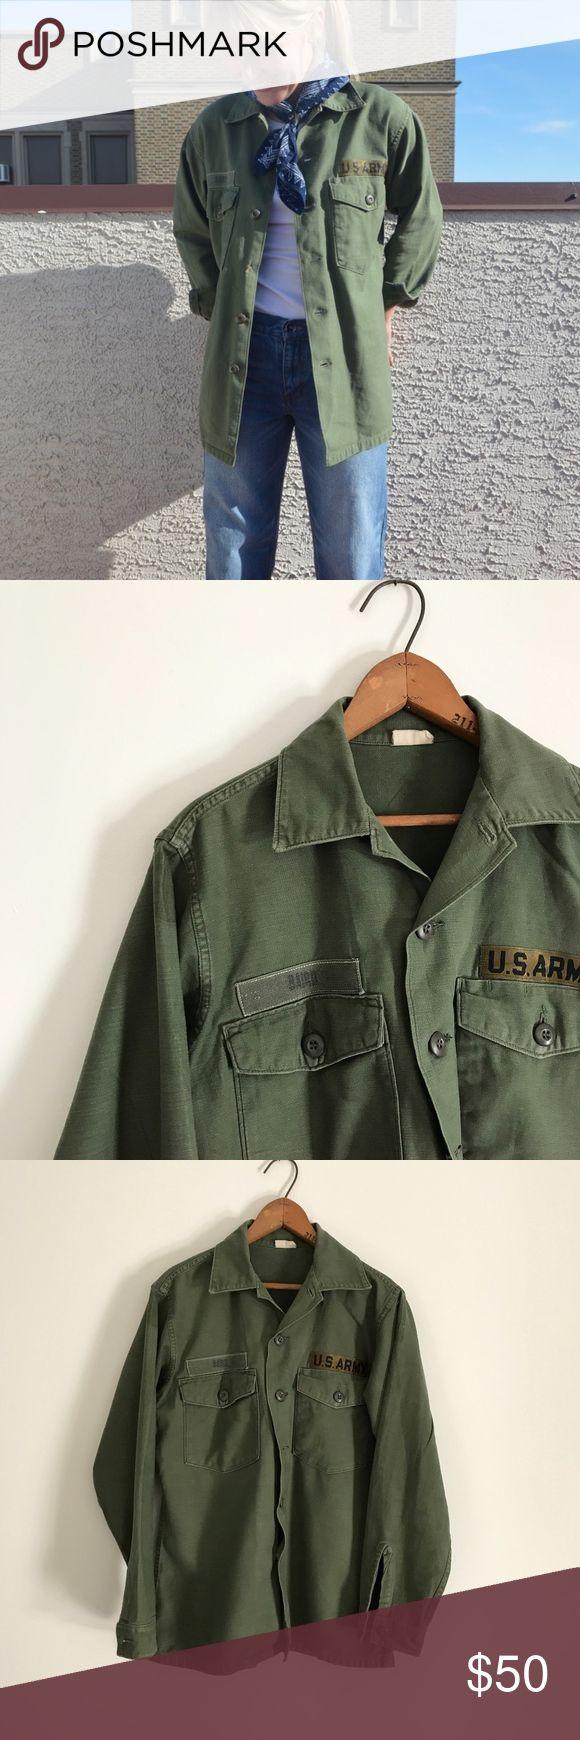 baird's army jacket // u.s. army original KAOf1j33